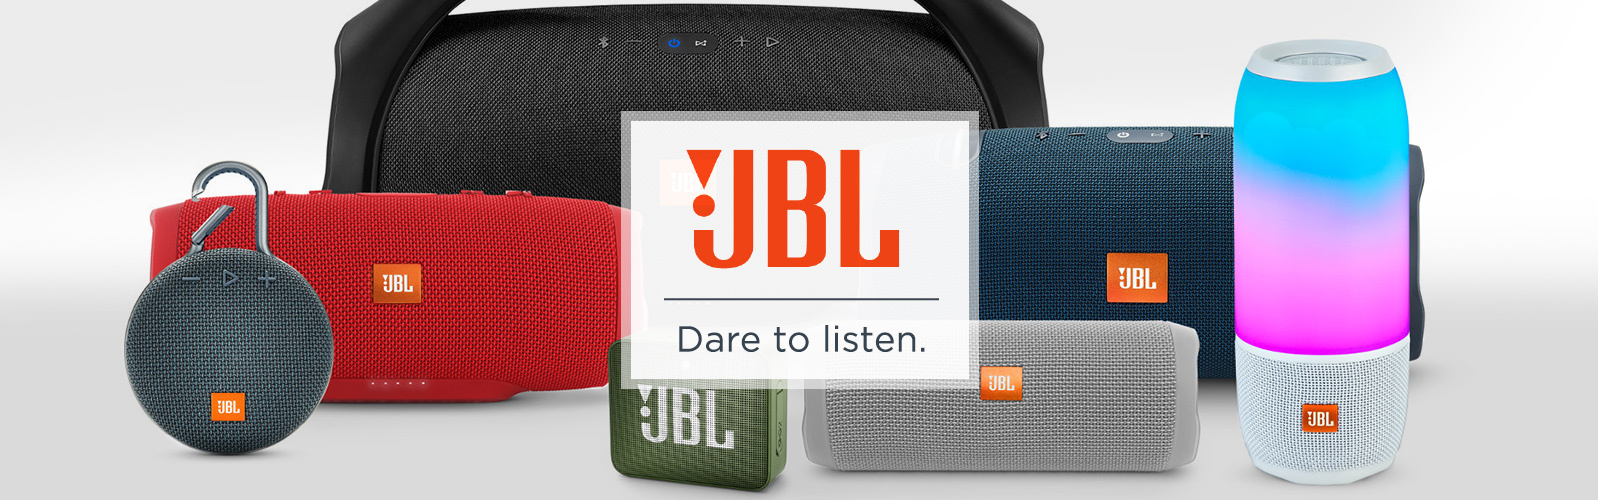 JBL — Dare to listen.